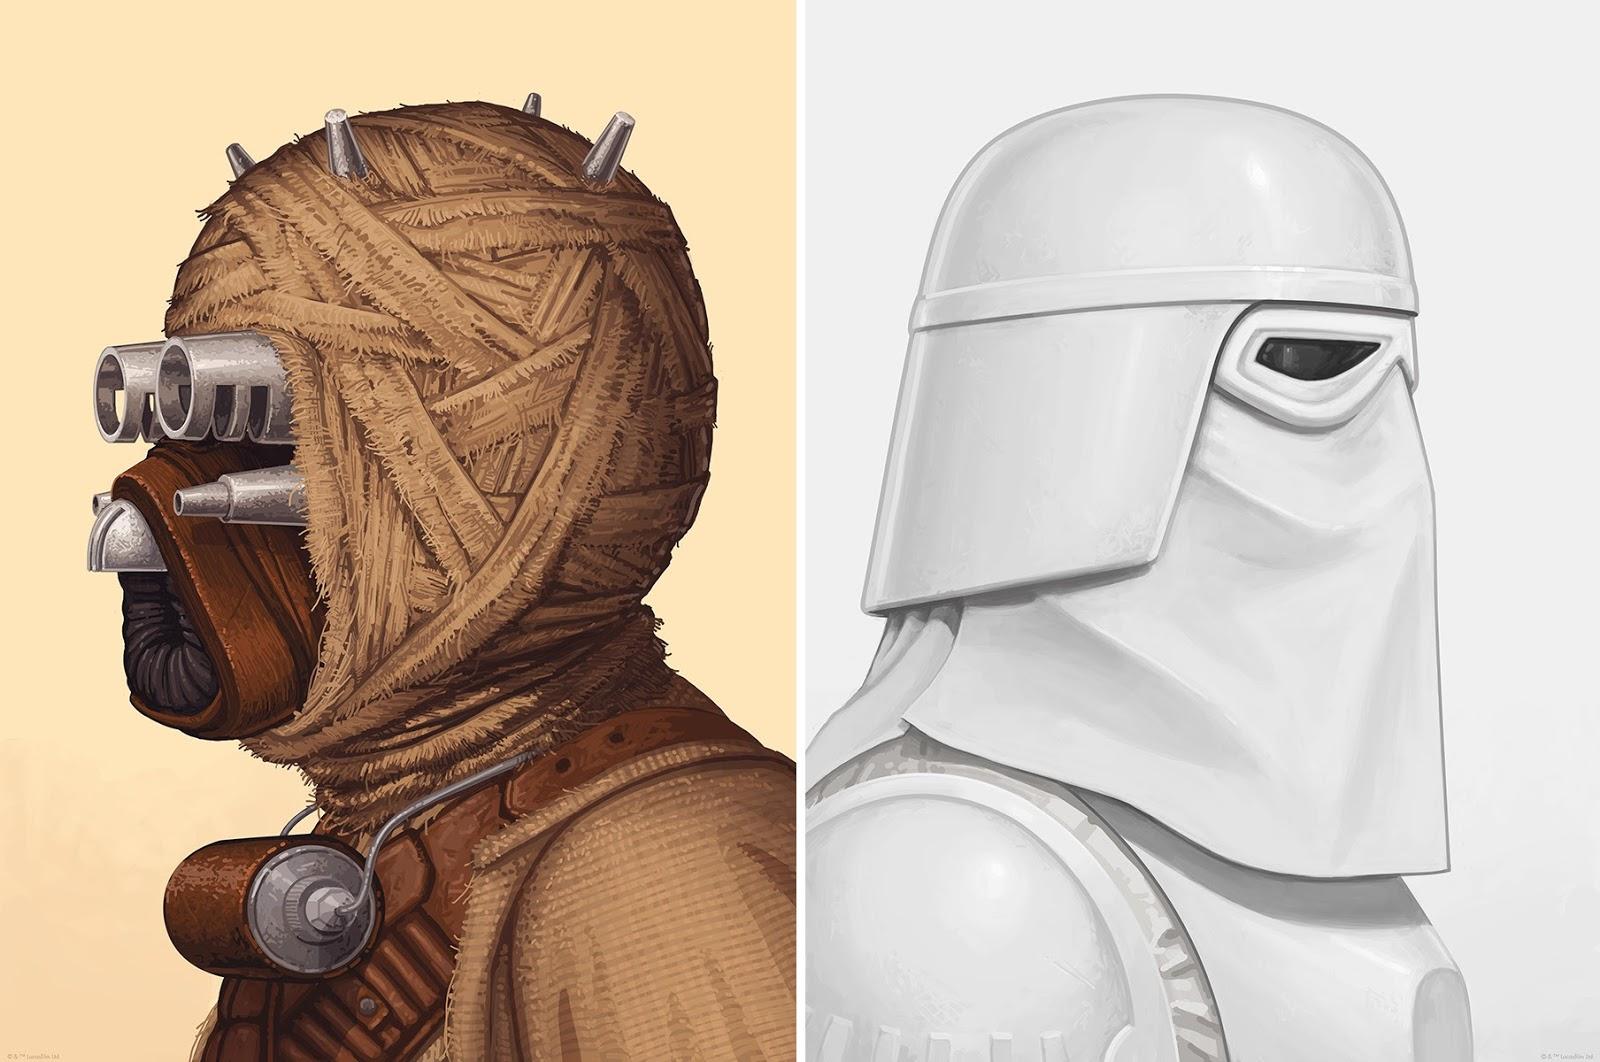 The Blot Says Star Wars Tusken Raider Snowtrooper Portrait